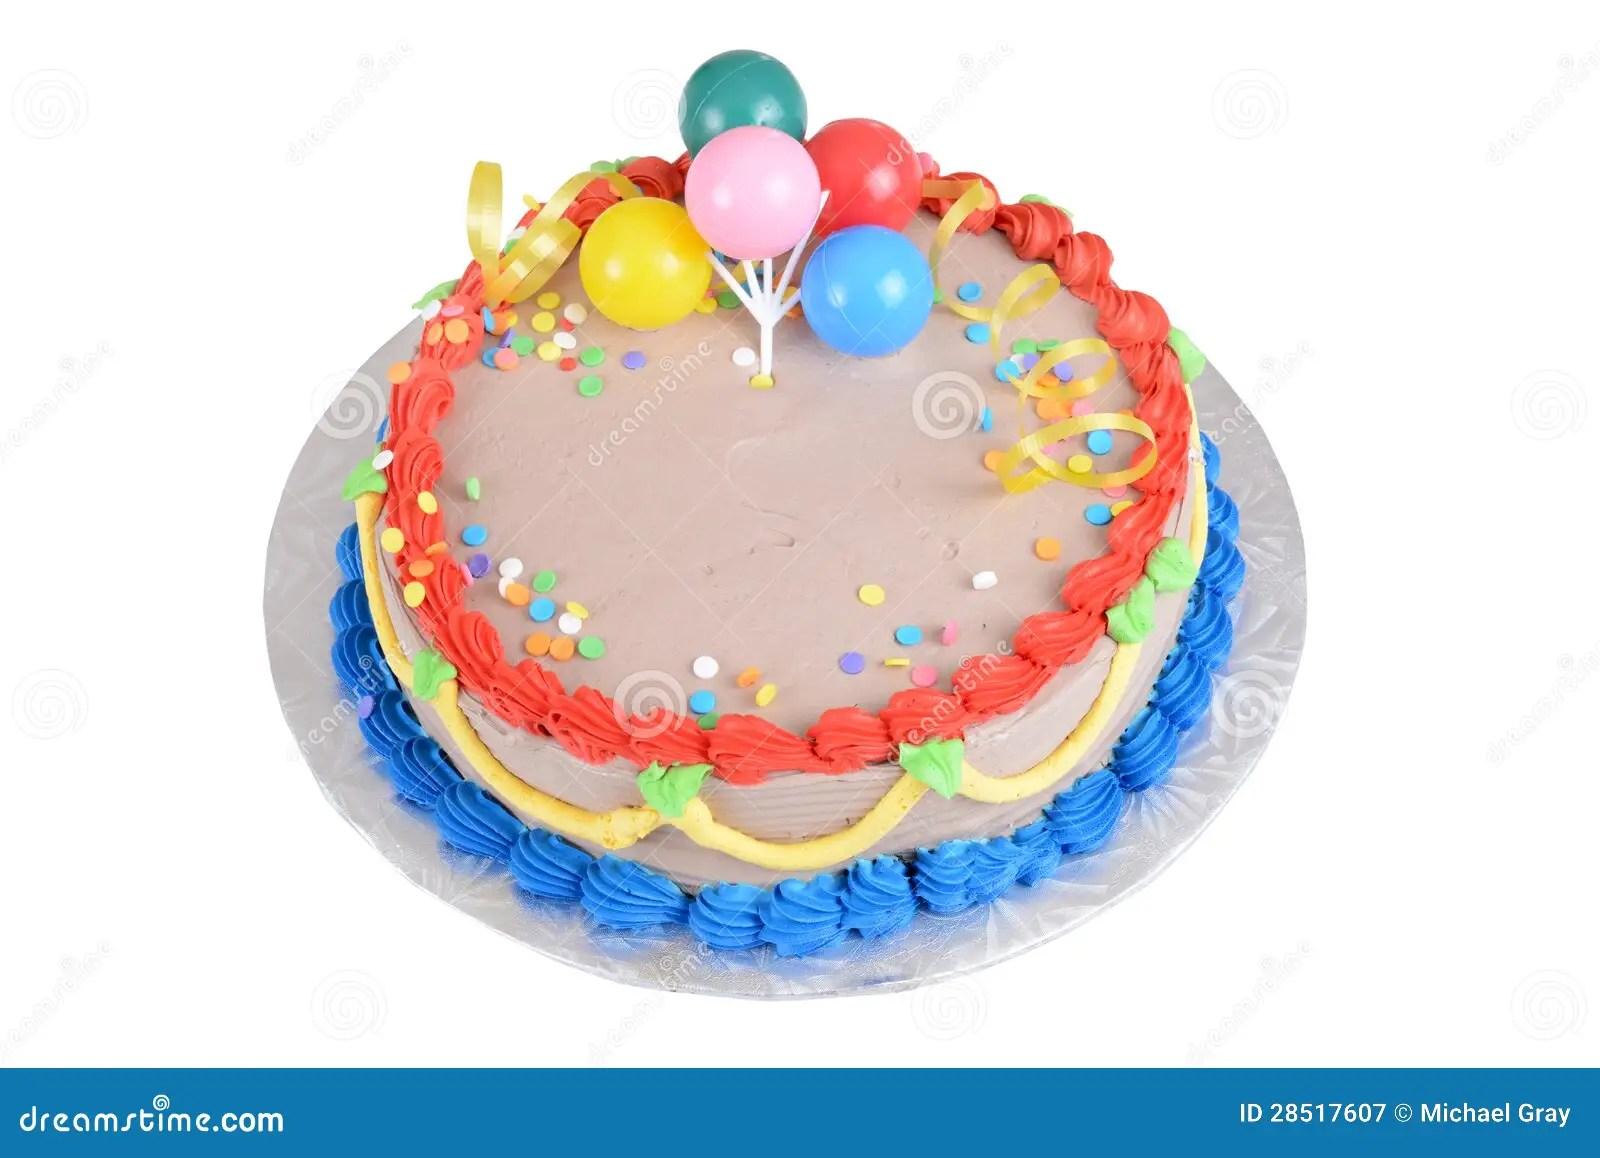 Top View Chocolate Birthday Cake Royalty Free Stock